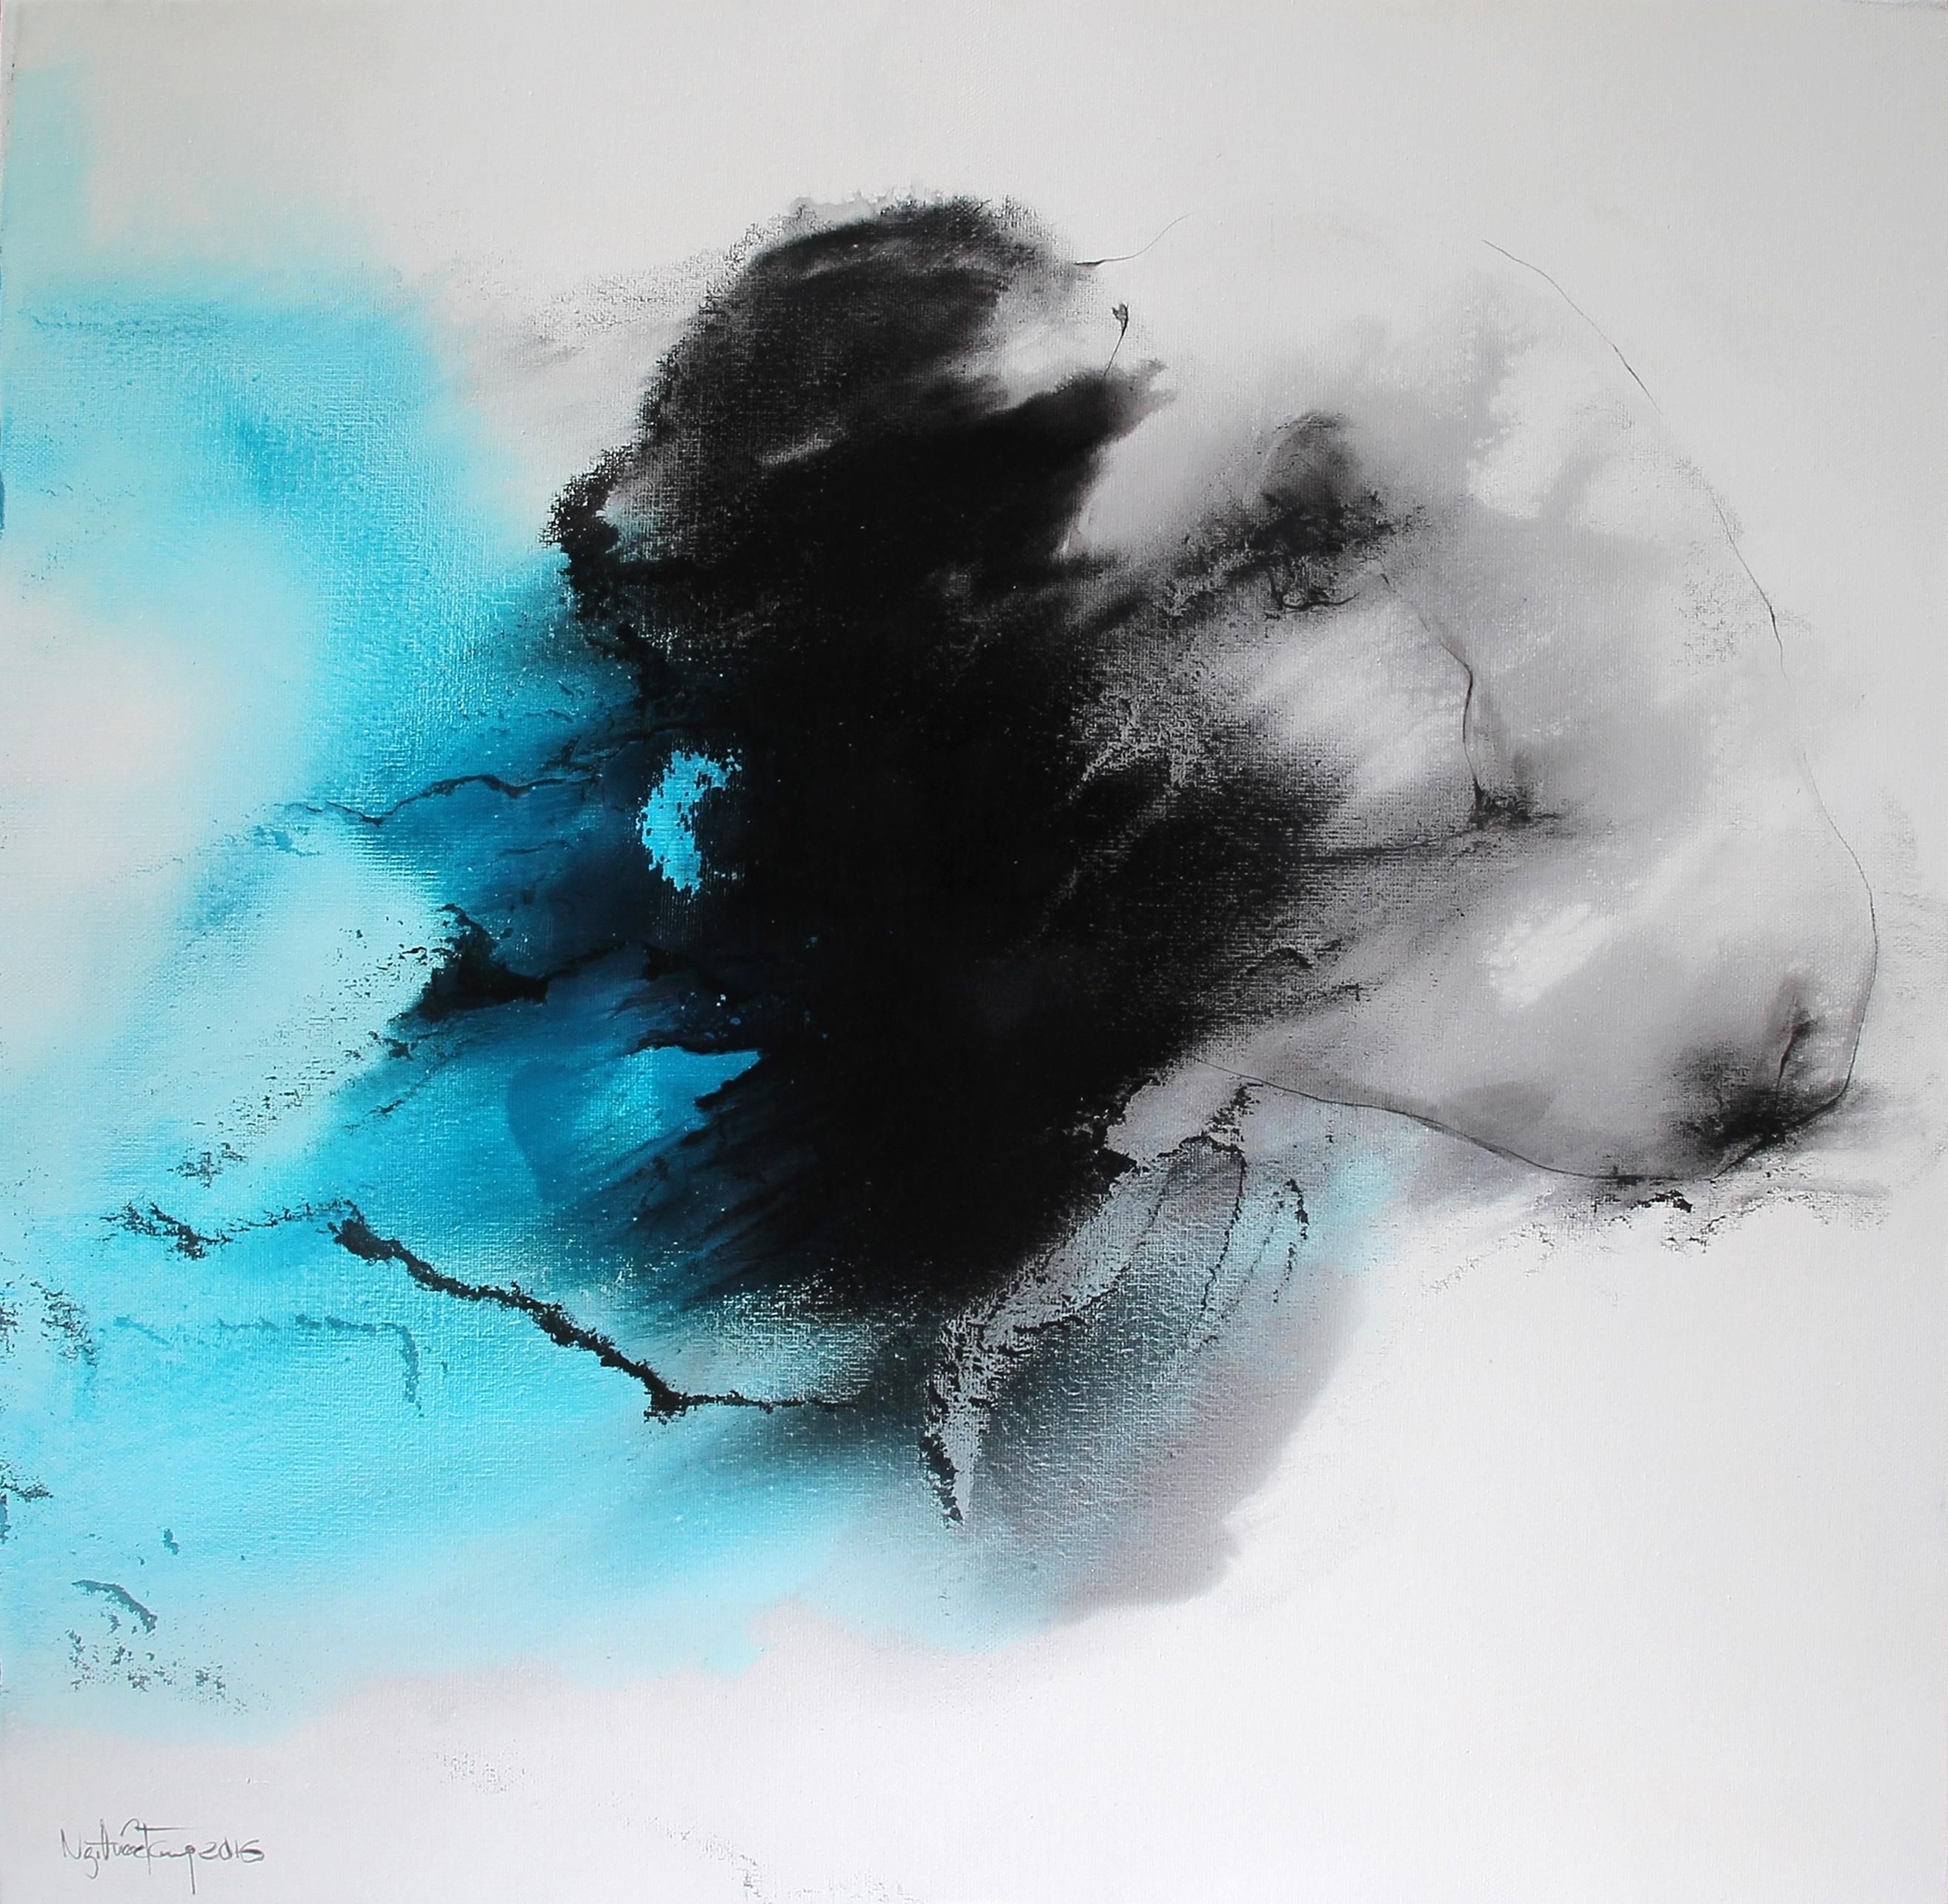 Blue Space No. 1